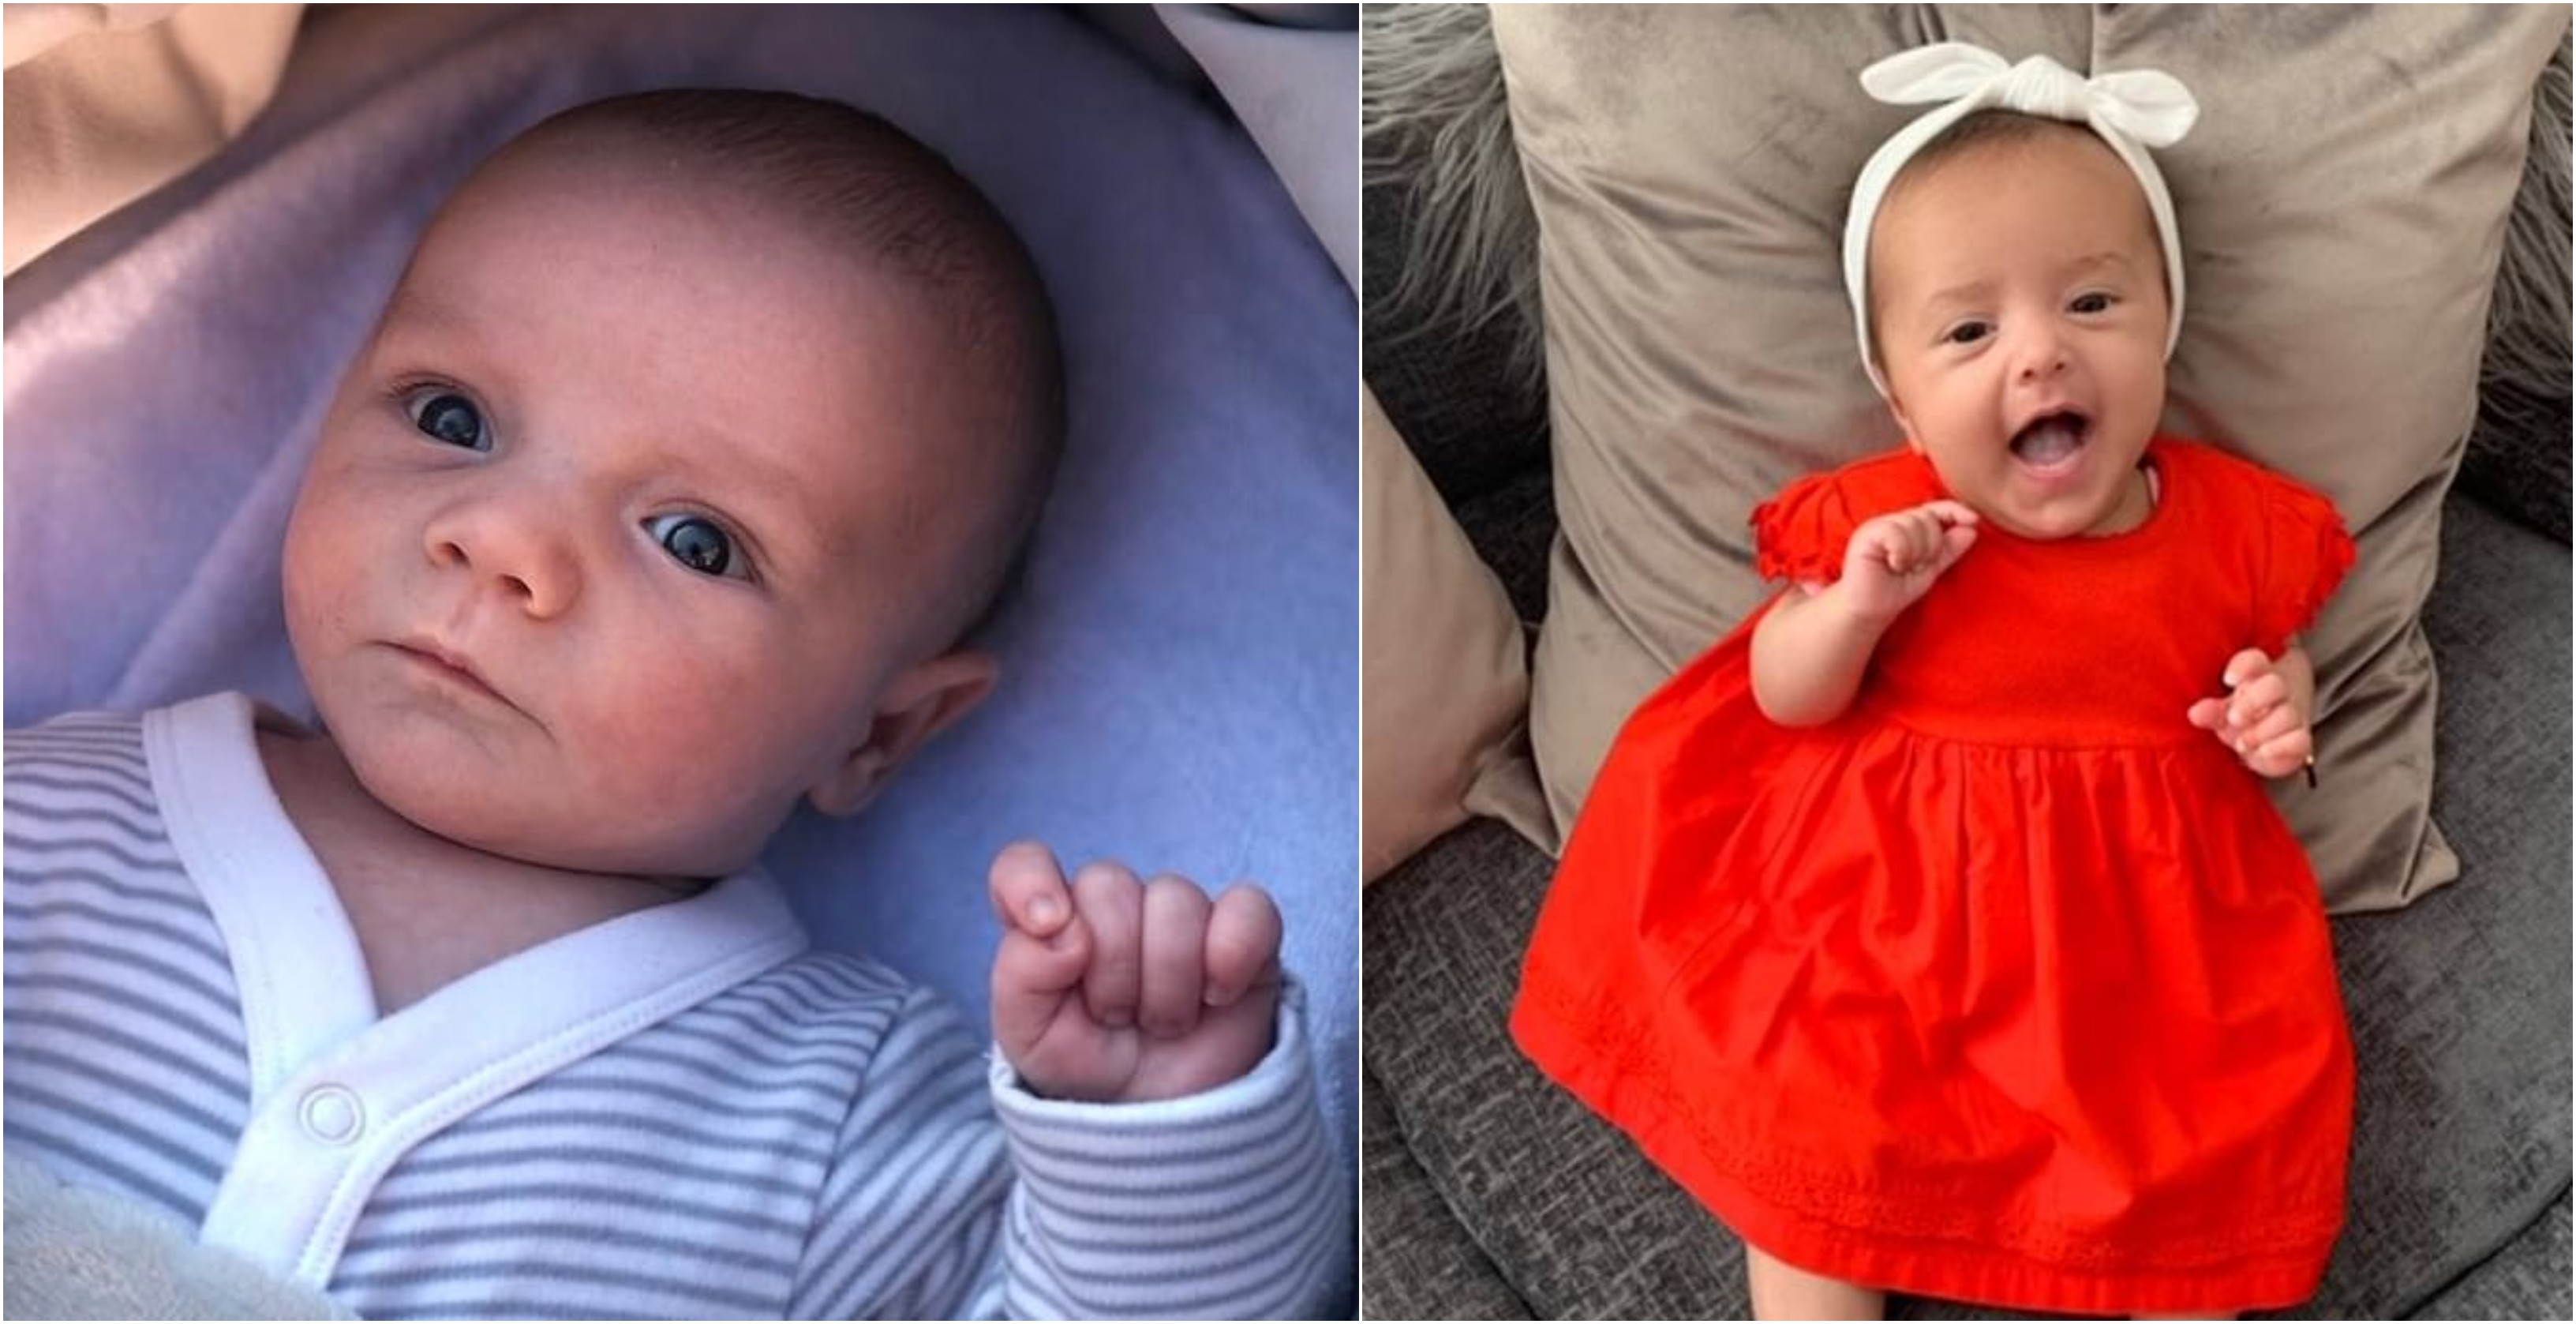 Exista speranta. La nici doua luni de viata, doi bebelusi au invins coronavirusul | Demamici.ro